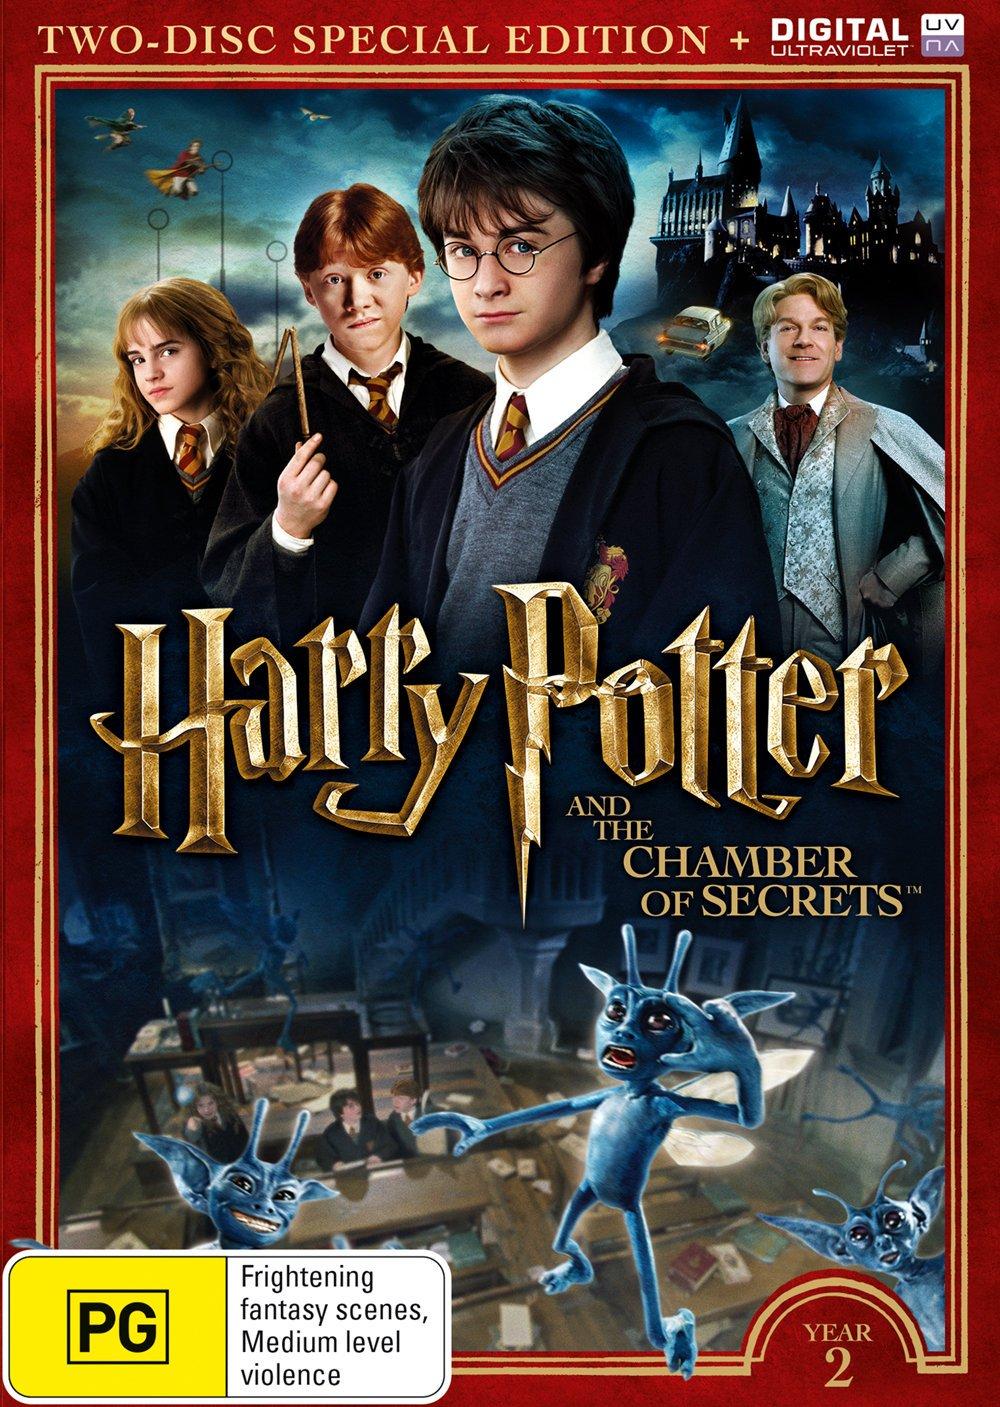 Amazon Com Harry Potter And Chamber Of Secrets Special Edition Non Usa Format Pal Region 4 Import Australia Daniel Radcliffe Rupert Grint Emma Watson Alan Rickman Chris Columbus Movies Tv